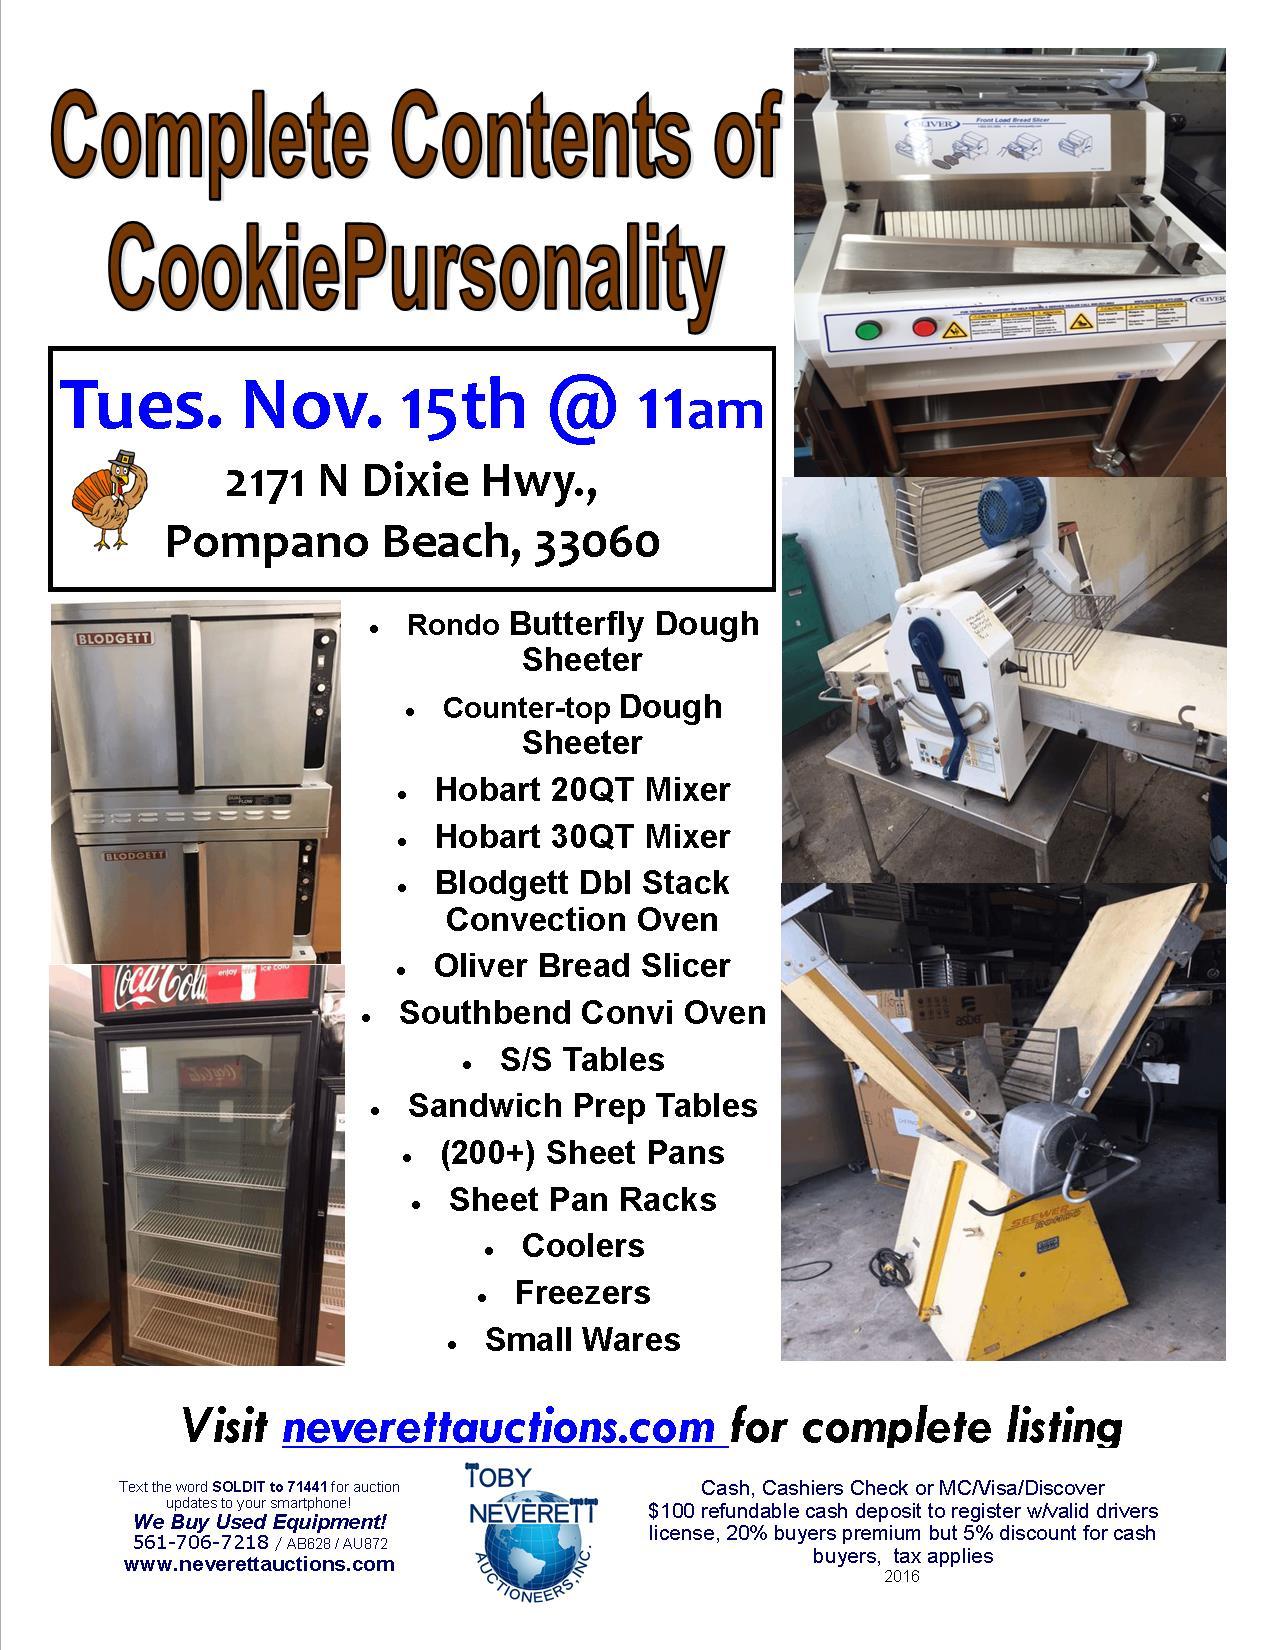 Cookiepursonality Flyer